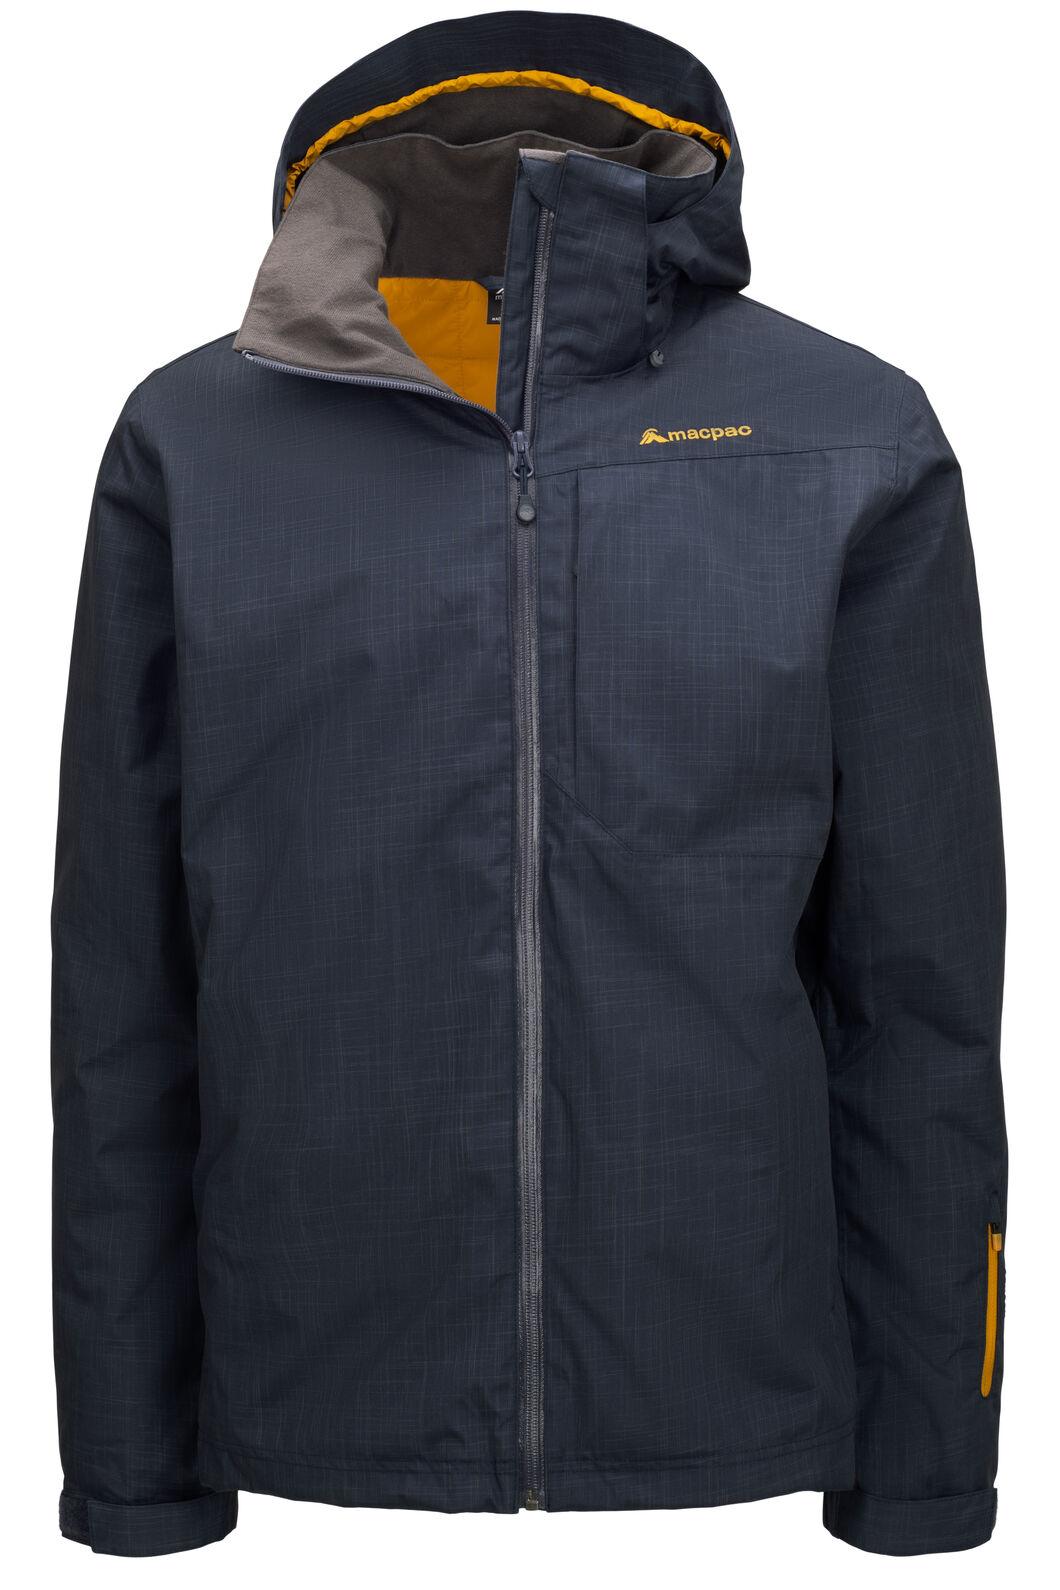 Macpac Men's Powder Reflex™ Ski Jacket, BLUE NIGHTS, hi-res